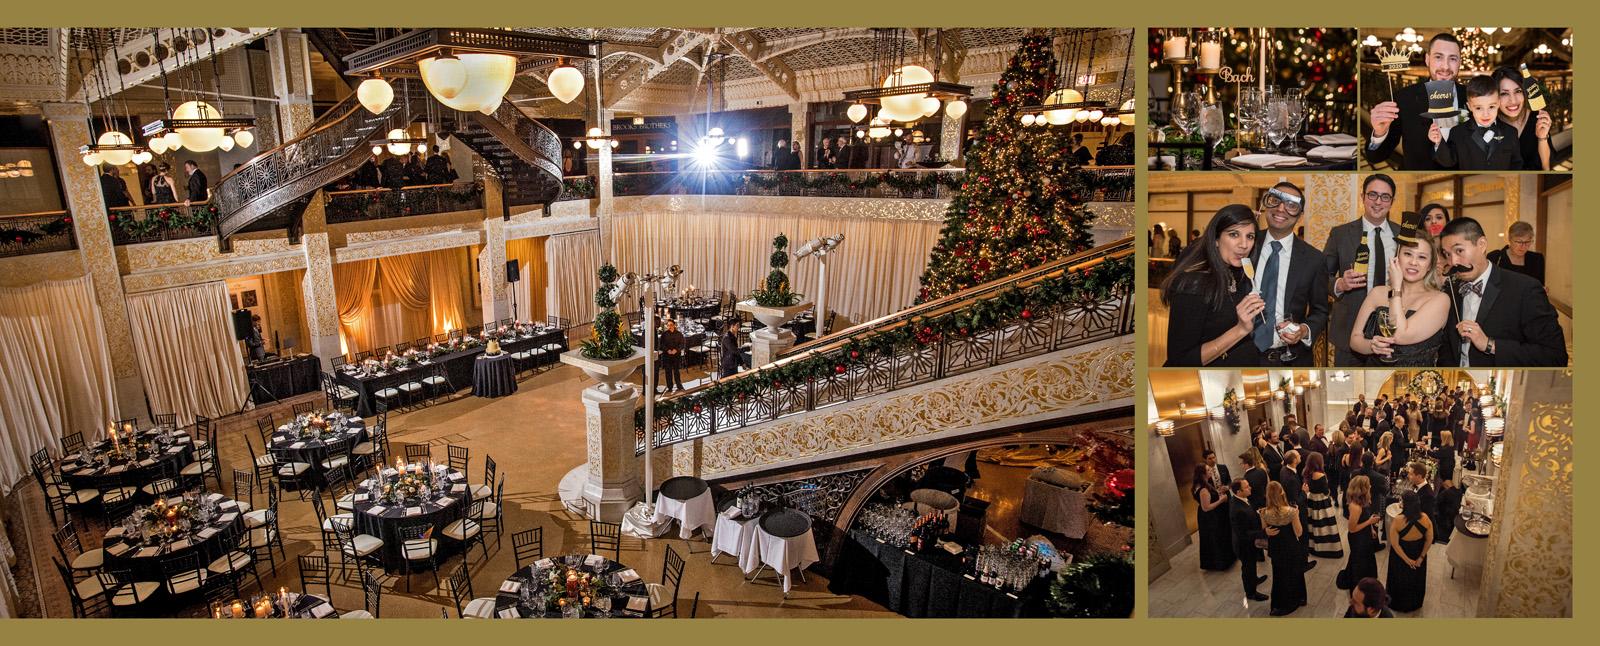 Rookery_Chicago_NYE_Wedding20